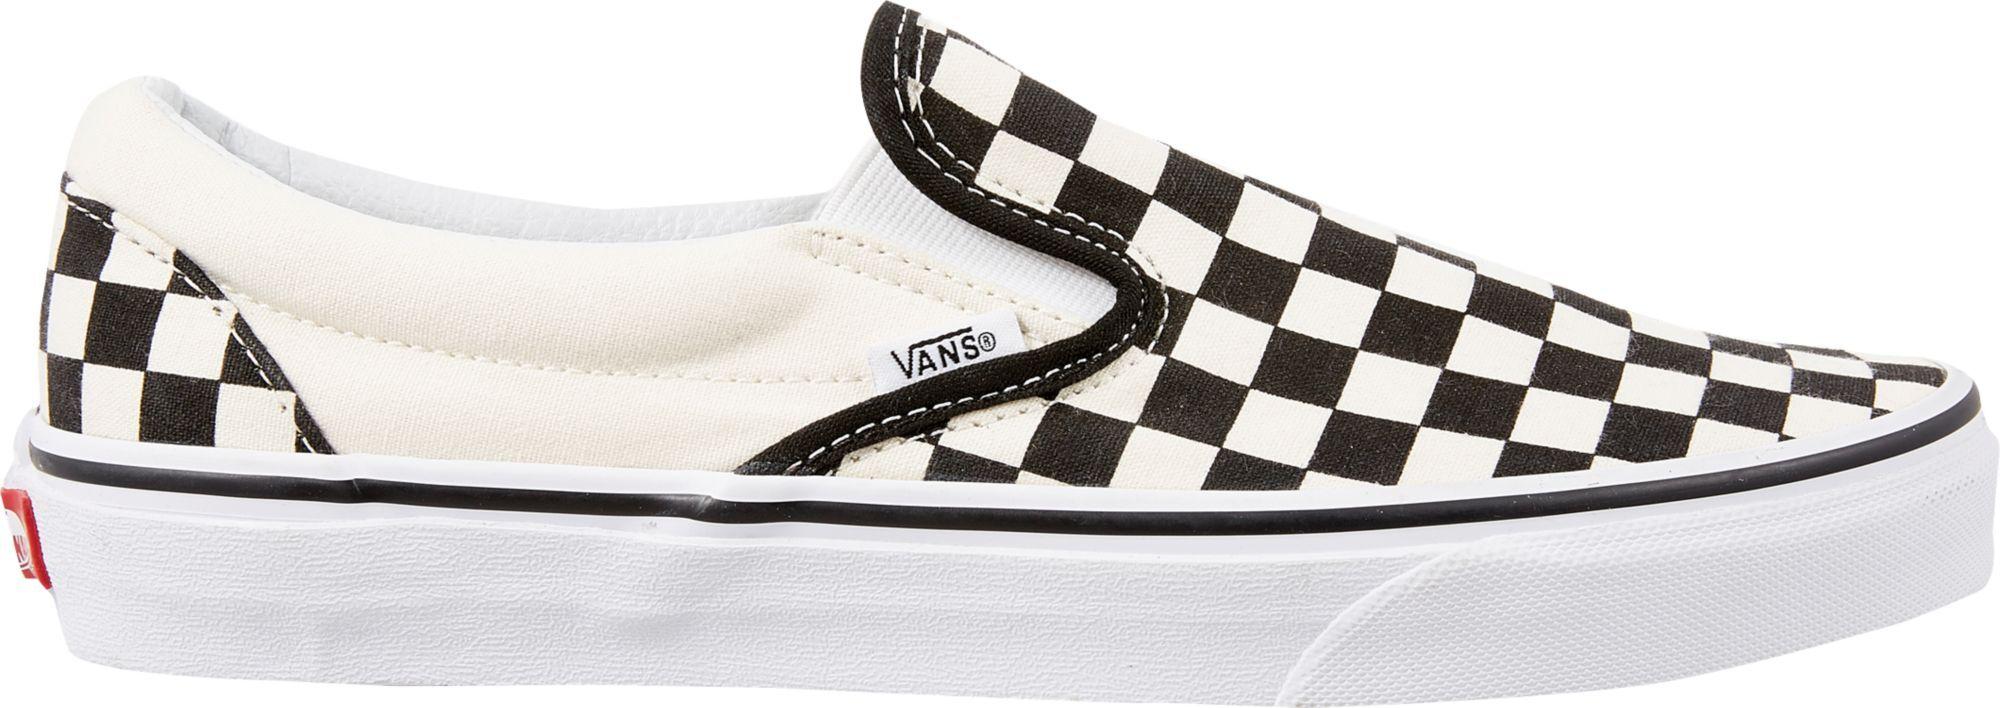 Vans Checkerboard Slip-On Shoes, Women's, Black